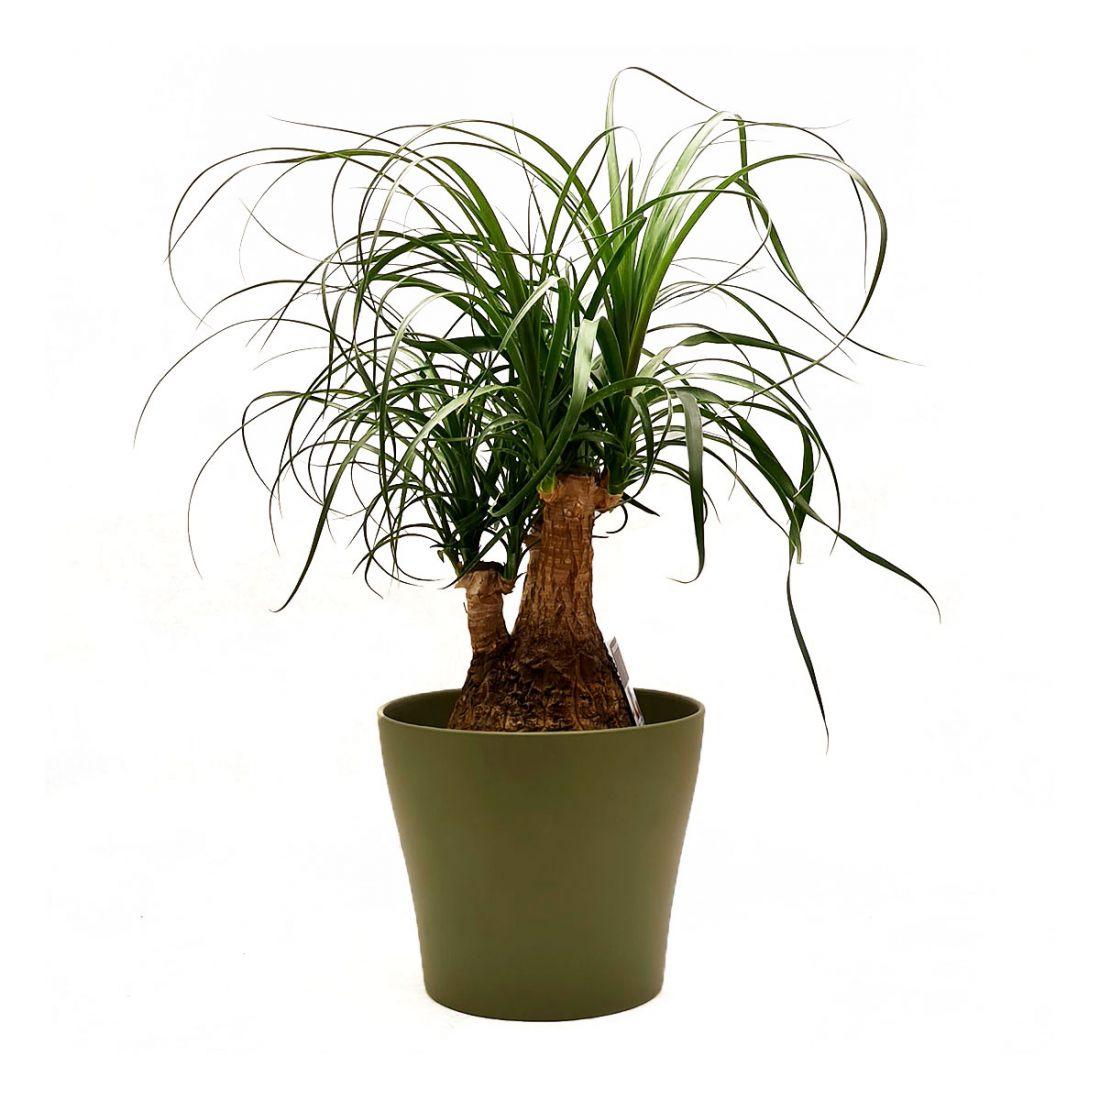 Vazoninis augalas NOLINA (BEAUCARNEA), be vazono